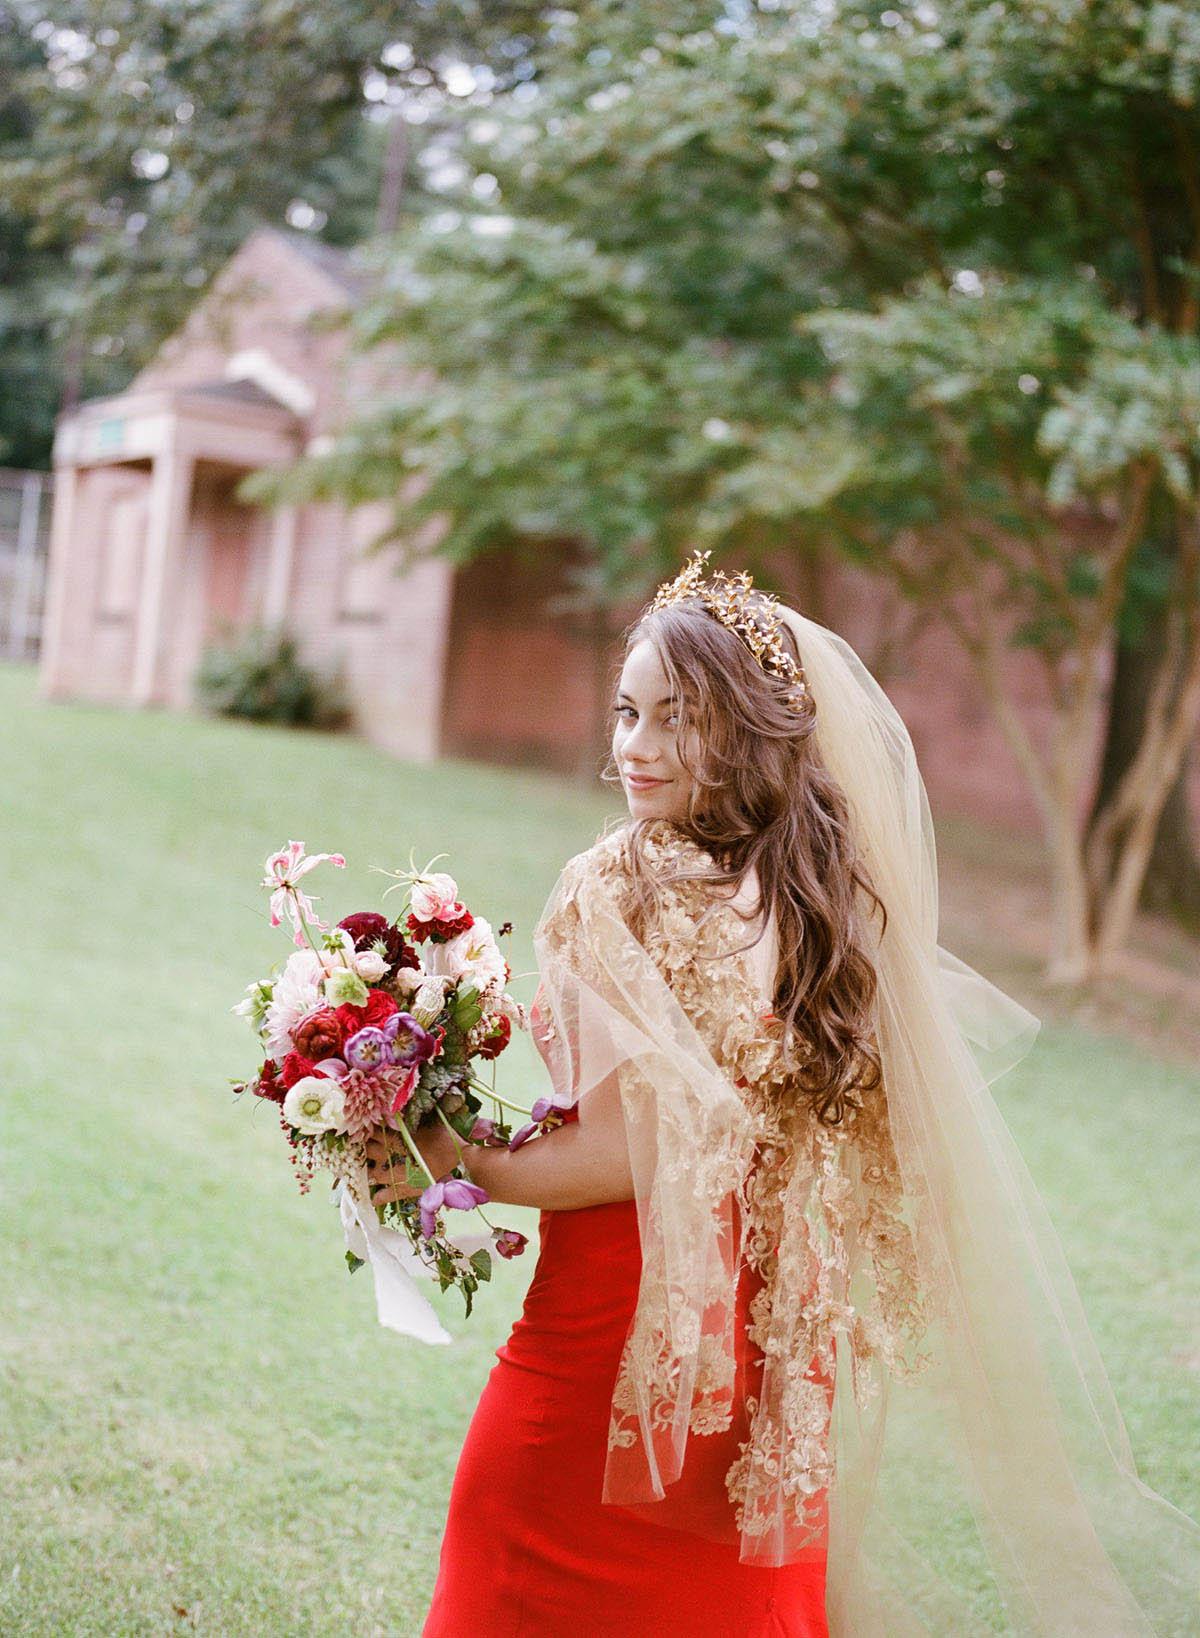 9-bride-red-dress.jpg